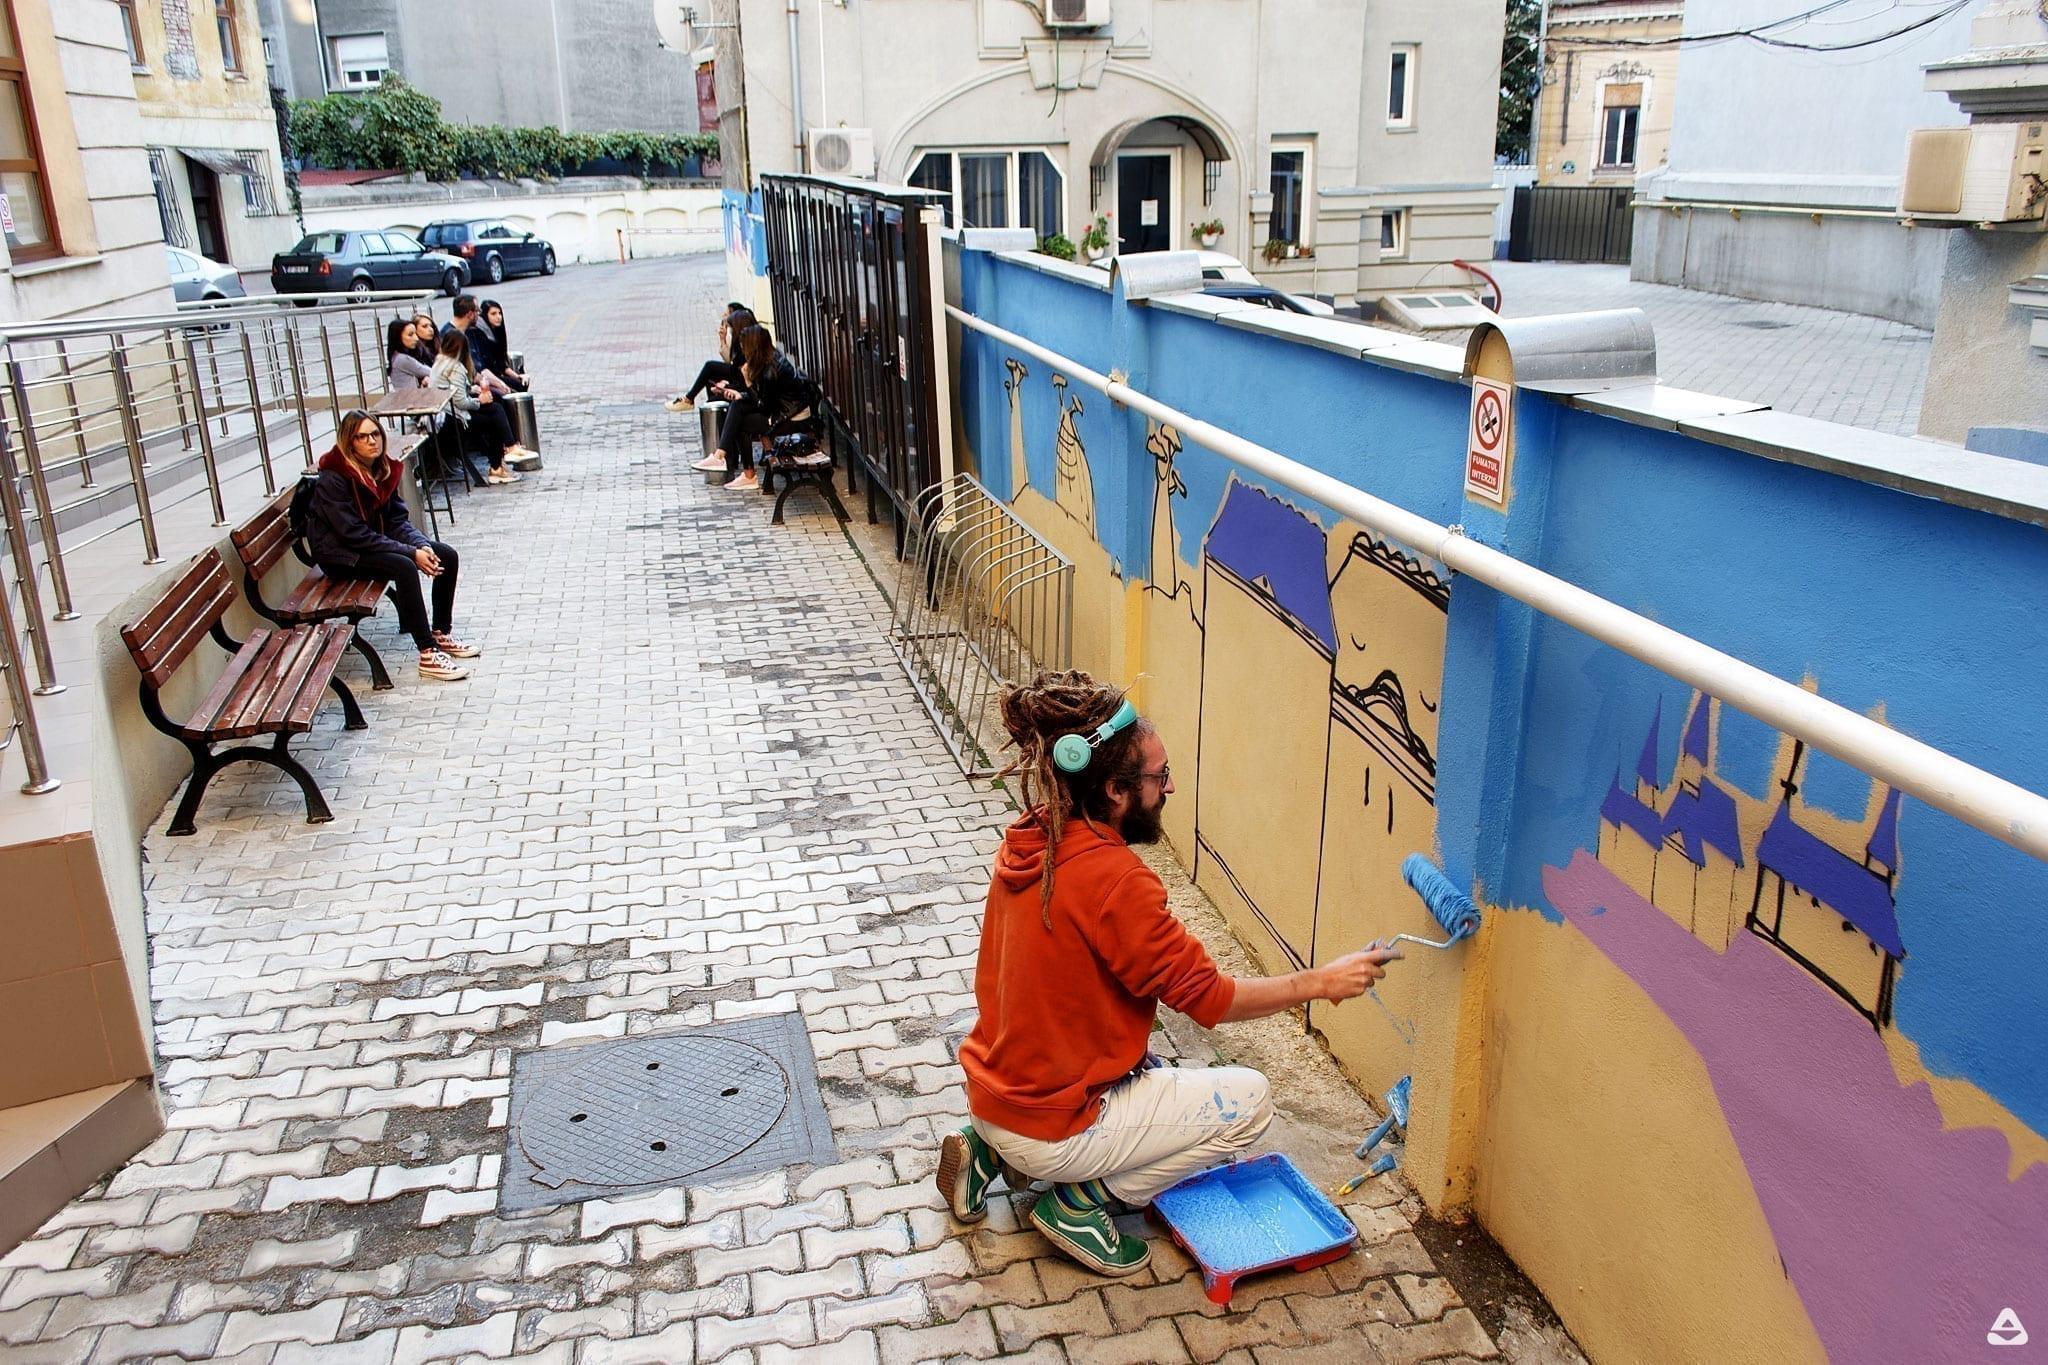 Lucian Niță – KSELEQOQYNQYSHY Un-hidden Bucharest Lucian Nita - KSELEQOQYNQYSHY mural Facultatea de Sociologie